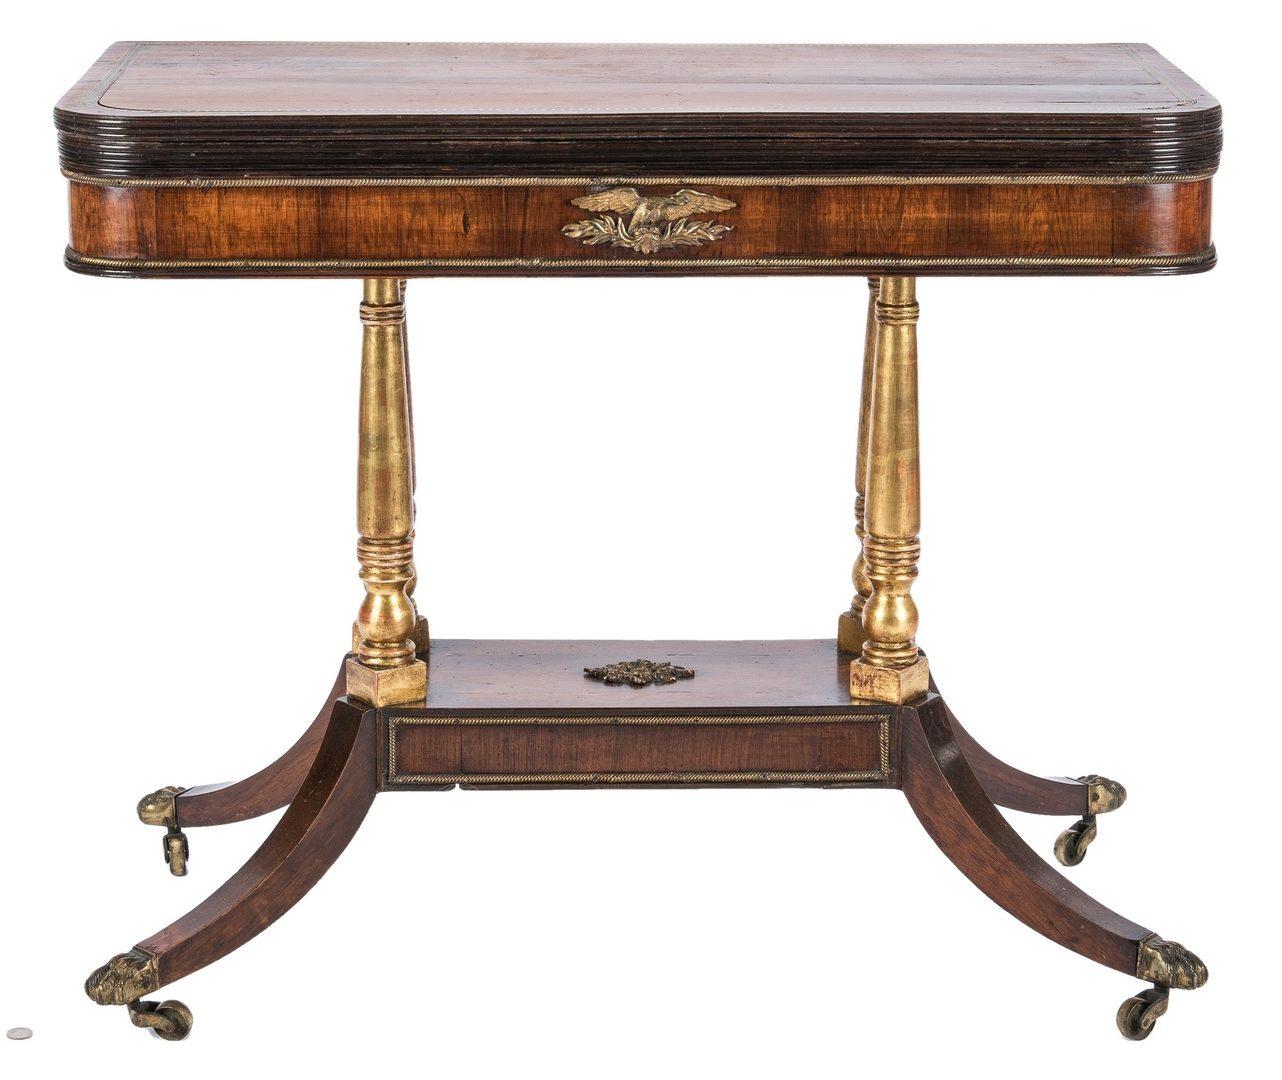 Lot 166: Regency Parcel Gilt Card Table with Eagle